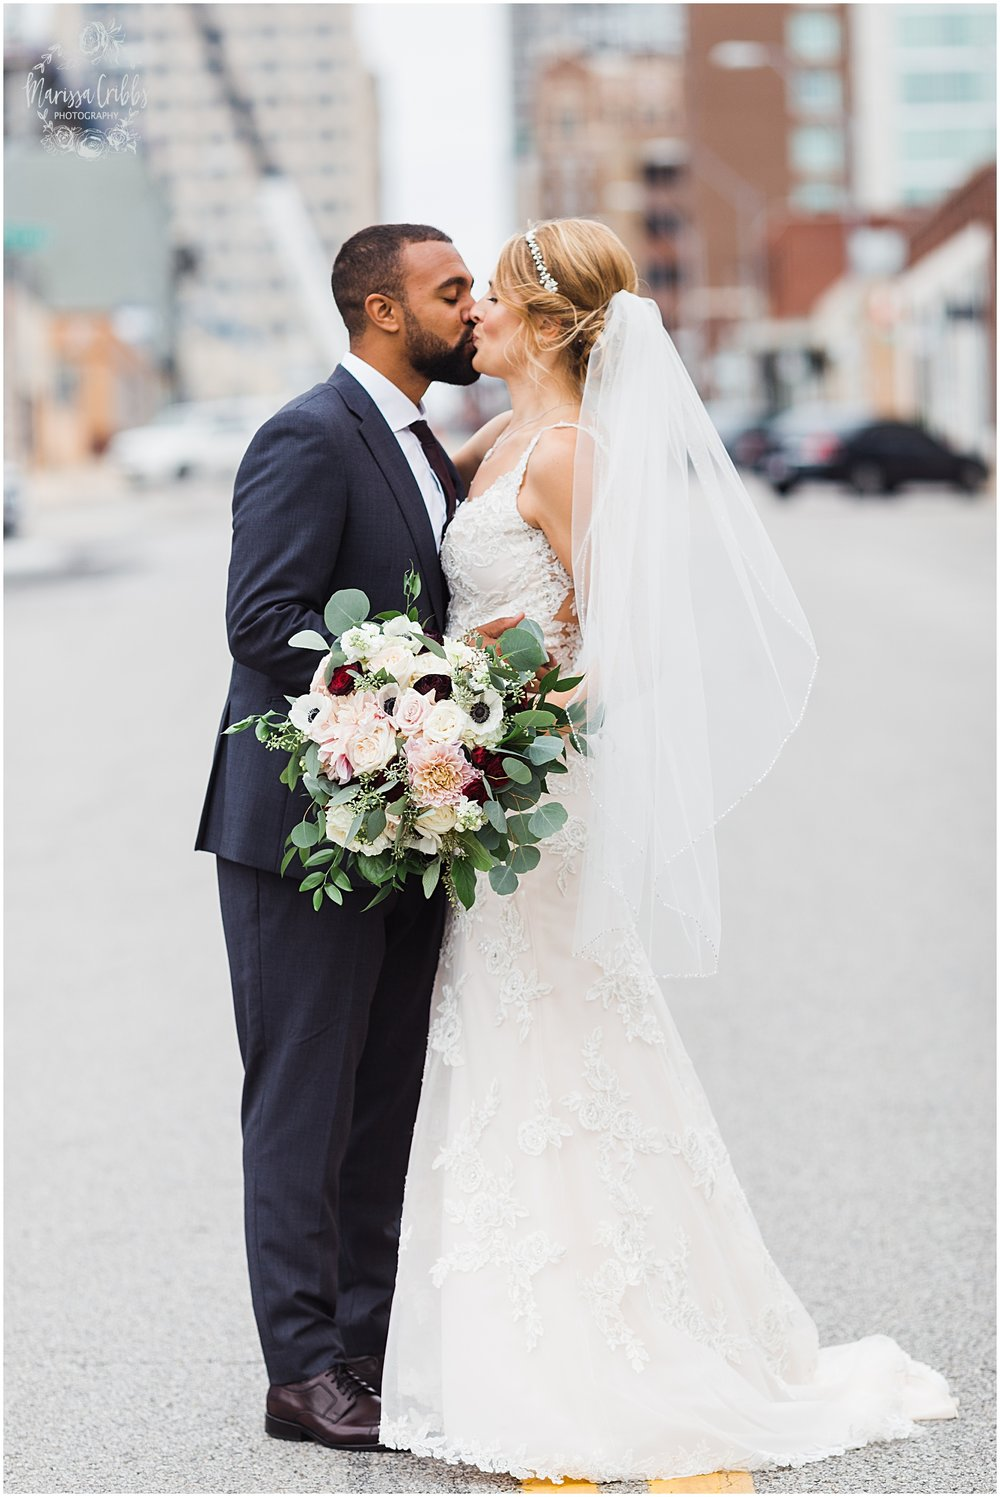 BAUER WEDDING   KELSEA & JUSTIN   MARISSA CRIBBS PHOTOGRAPHY_6541.jpg